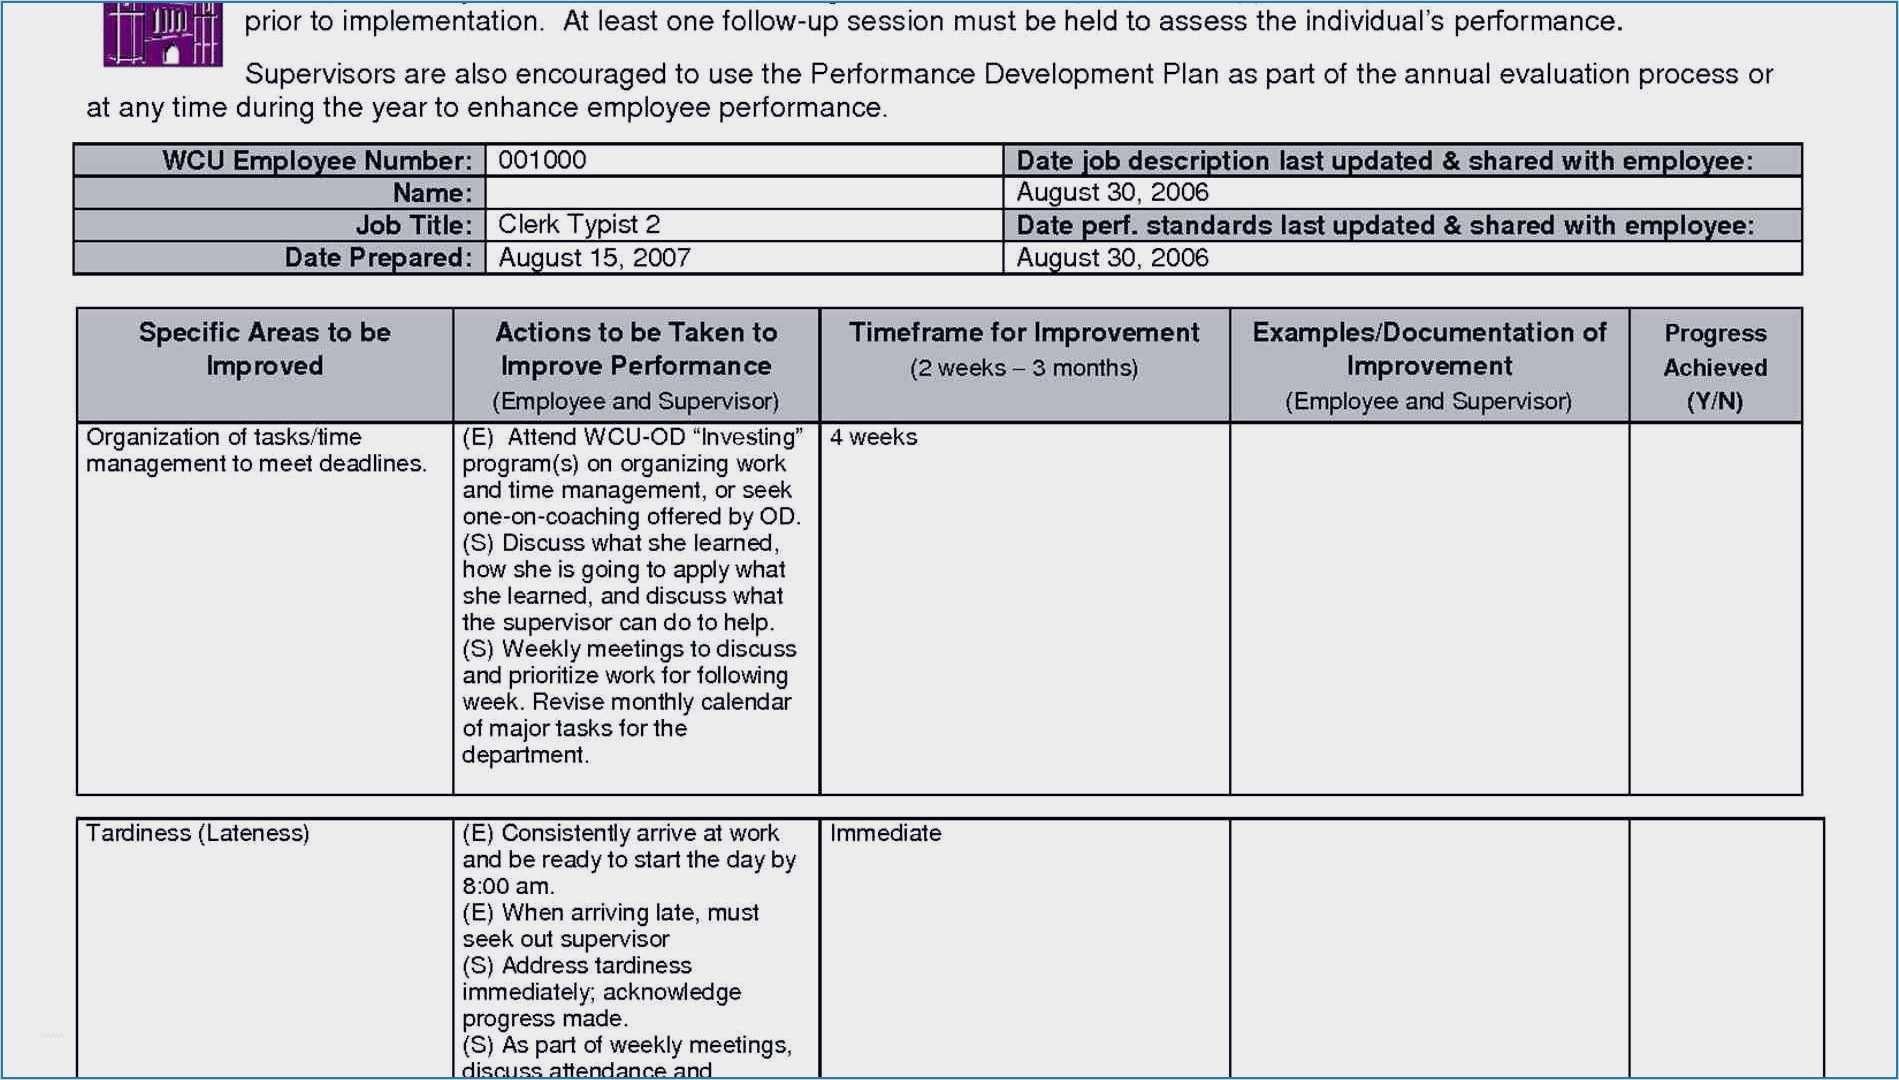 Cursive Writing Worksheets Cursive Words S Words Vorlage Verbandbuch Neu Gefahrstoffkatast In 2020 Event Planning Checklist Templates Event Planning Quotes How To Plan